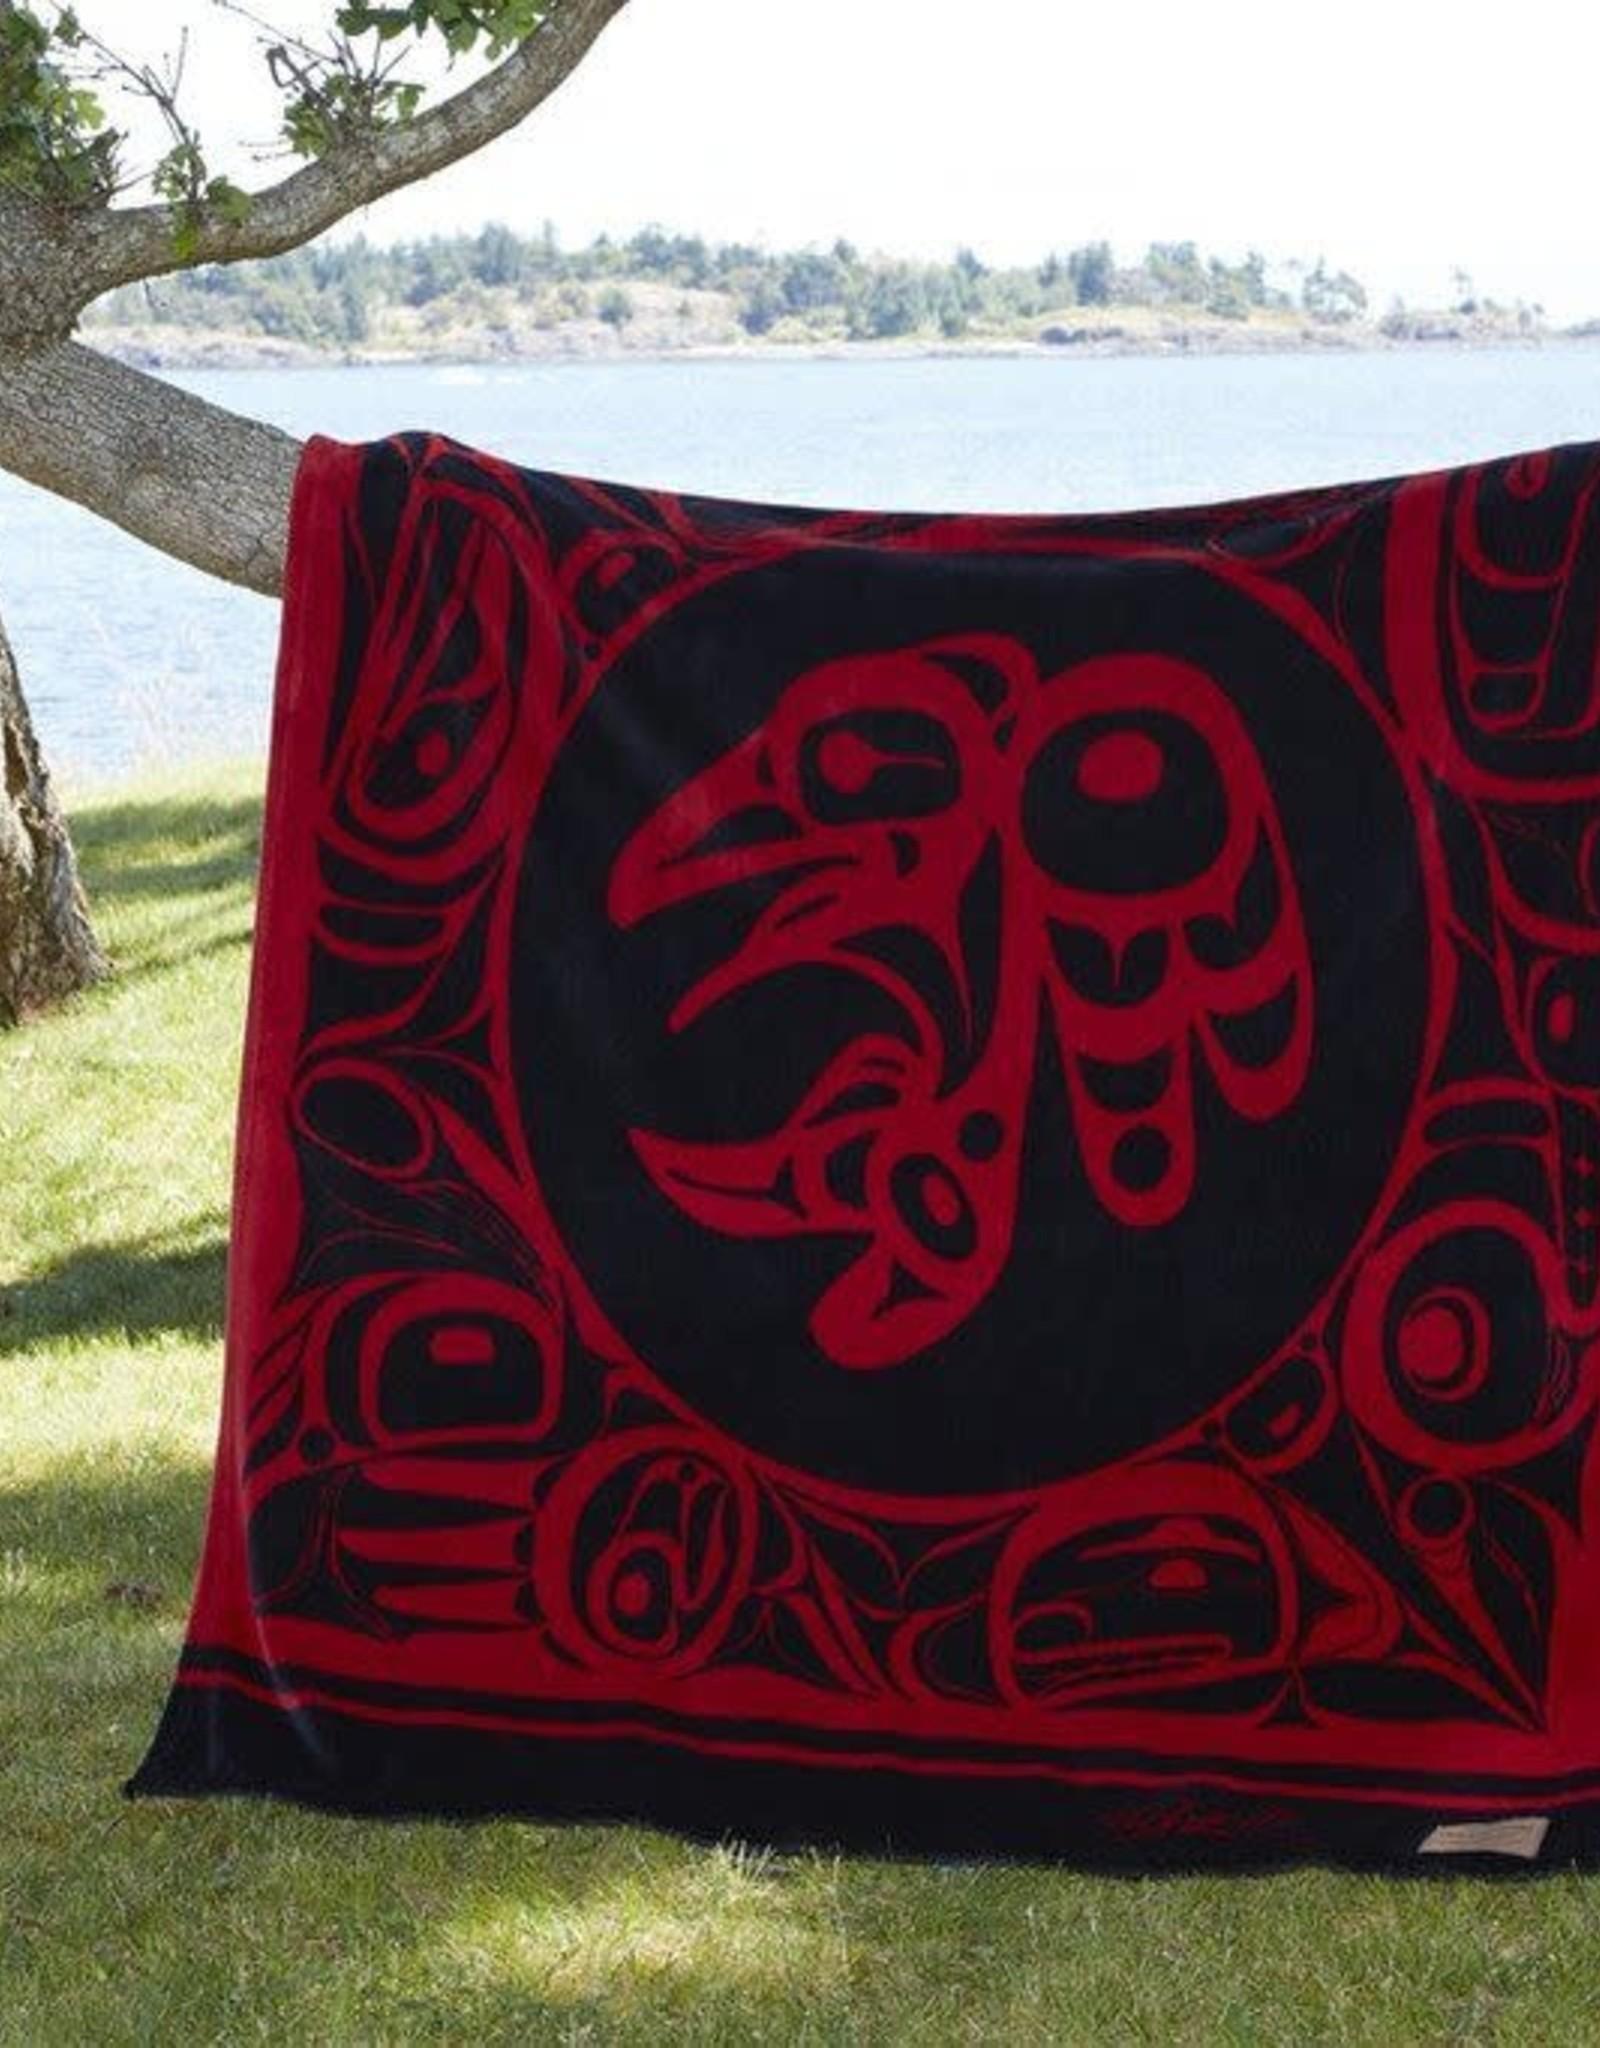 Kanata Blanket-Raven/ Red by Bill Helin